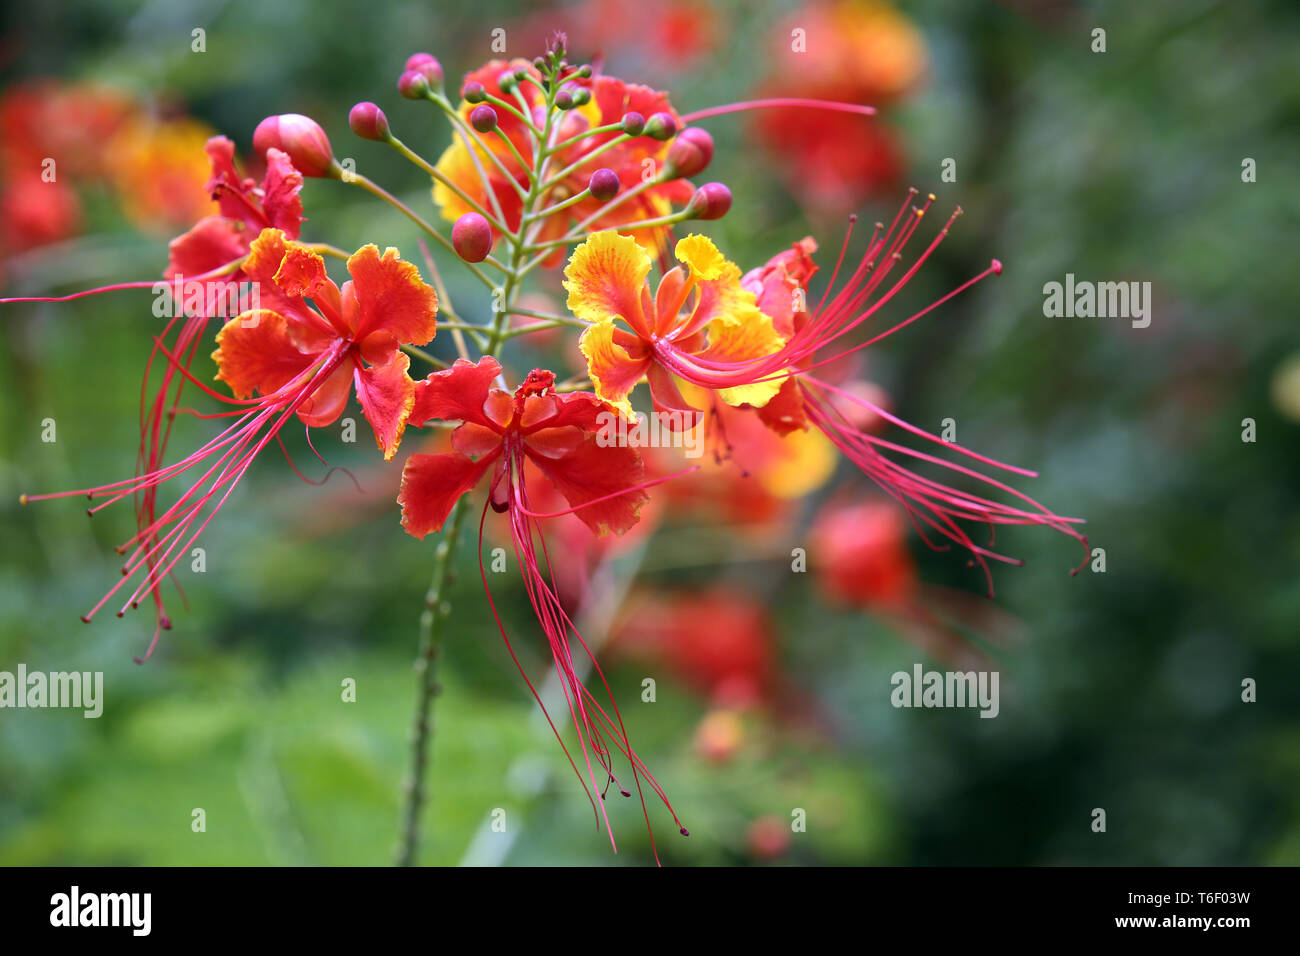 dwarf poinciana, pride of Barbados, flos pavonis - Stock Image